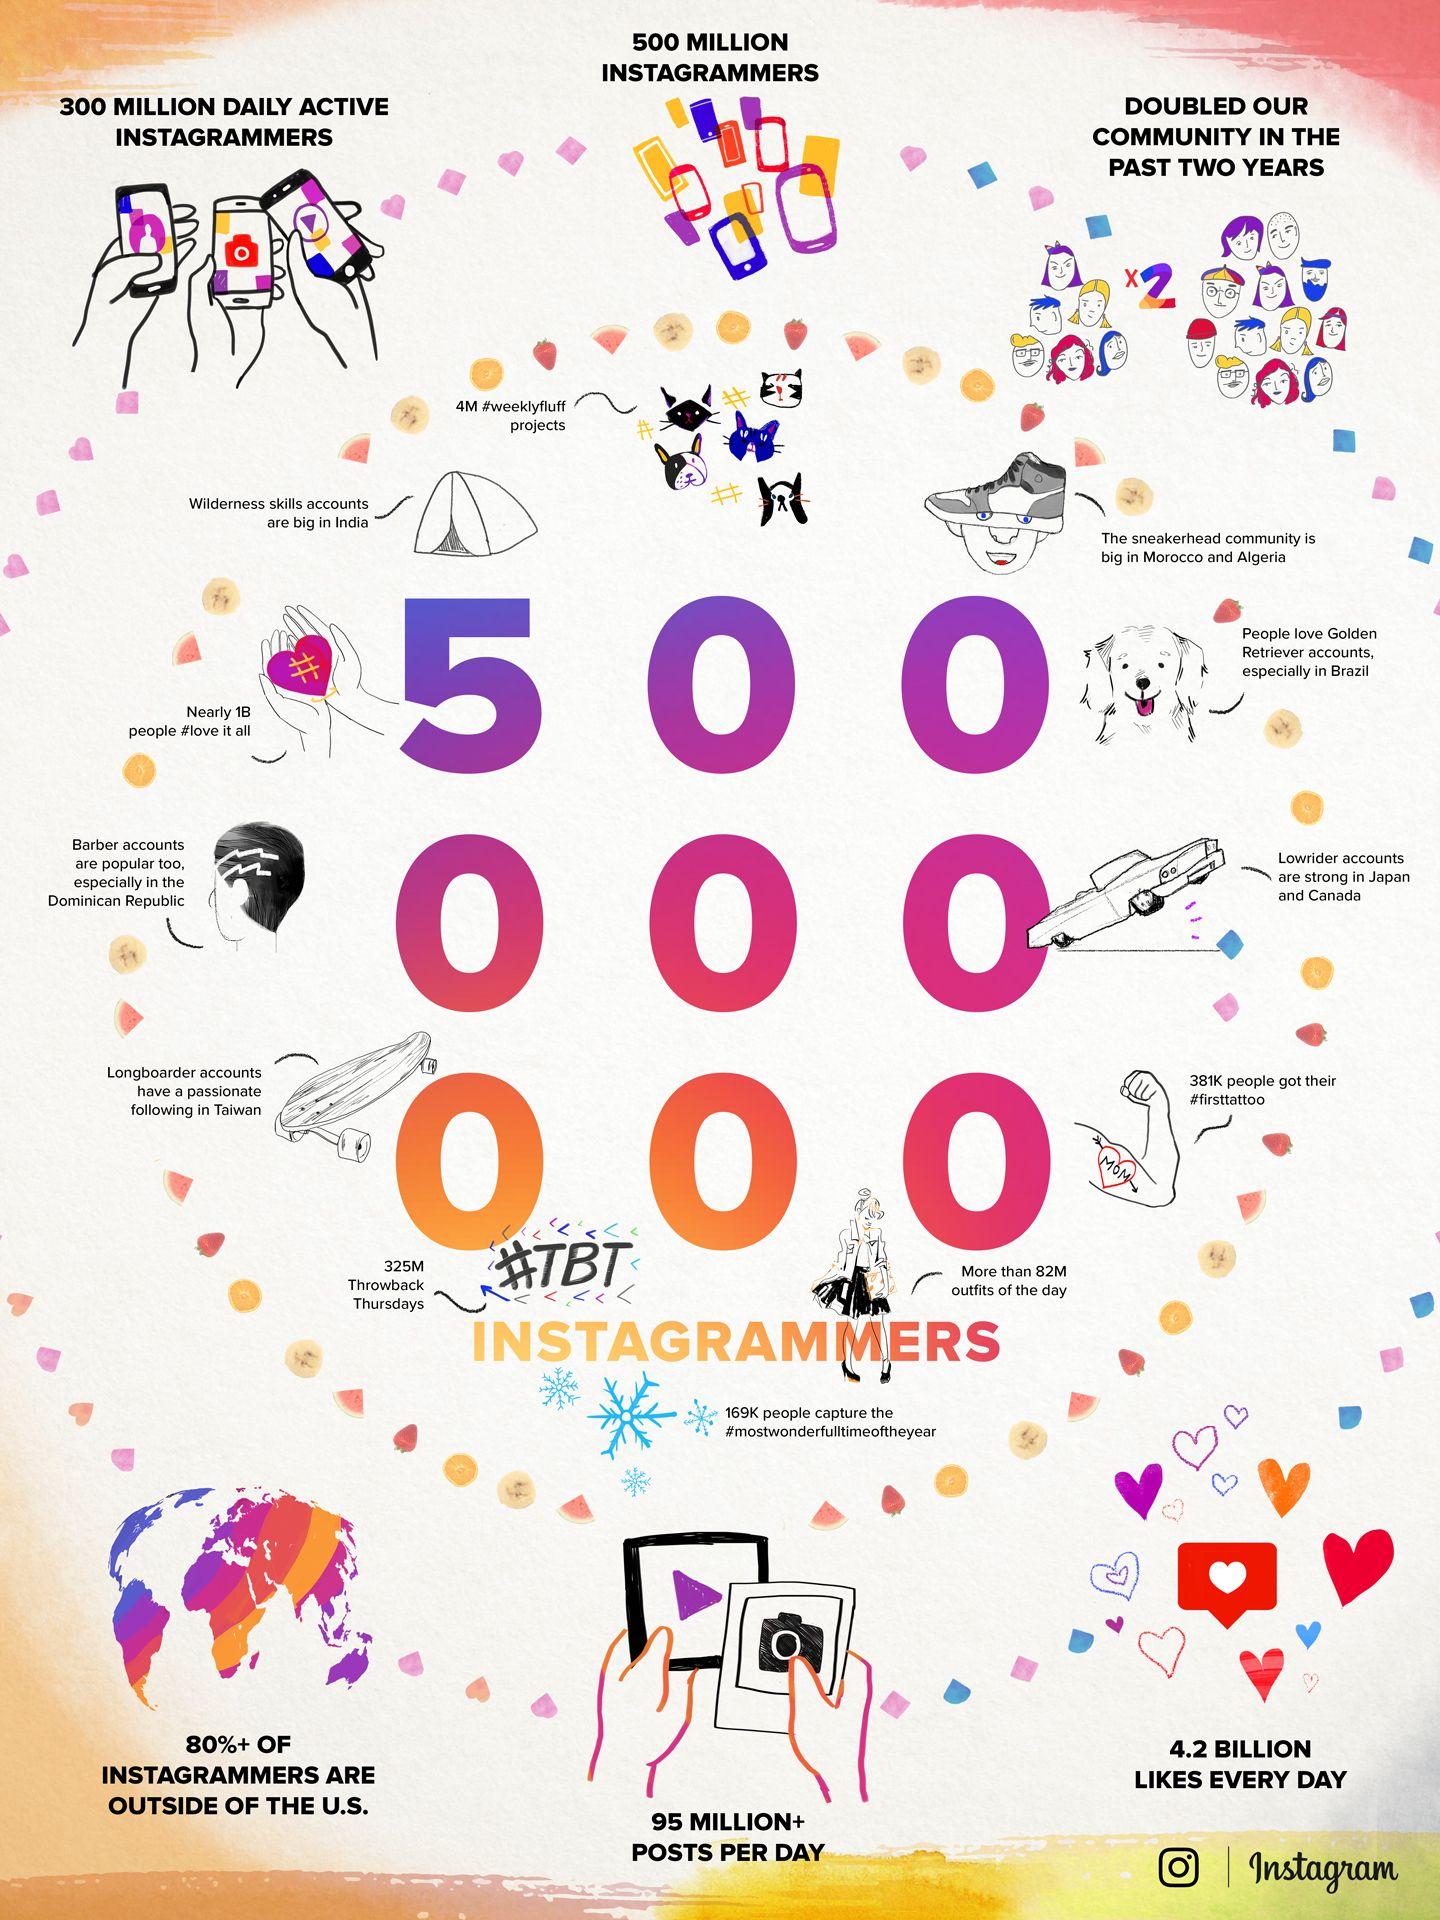 Pin by Adelowo Oluwaseyi on NEWS Instagram, Social media